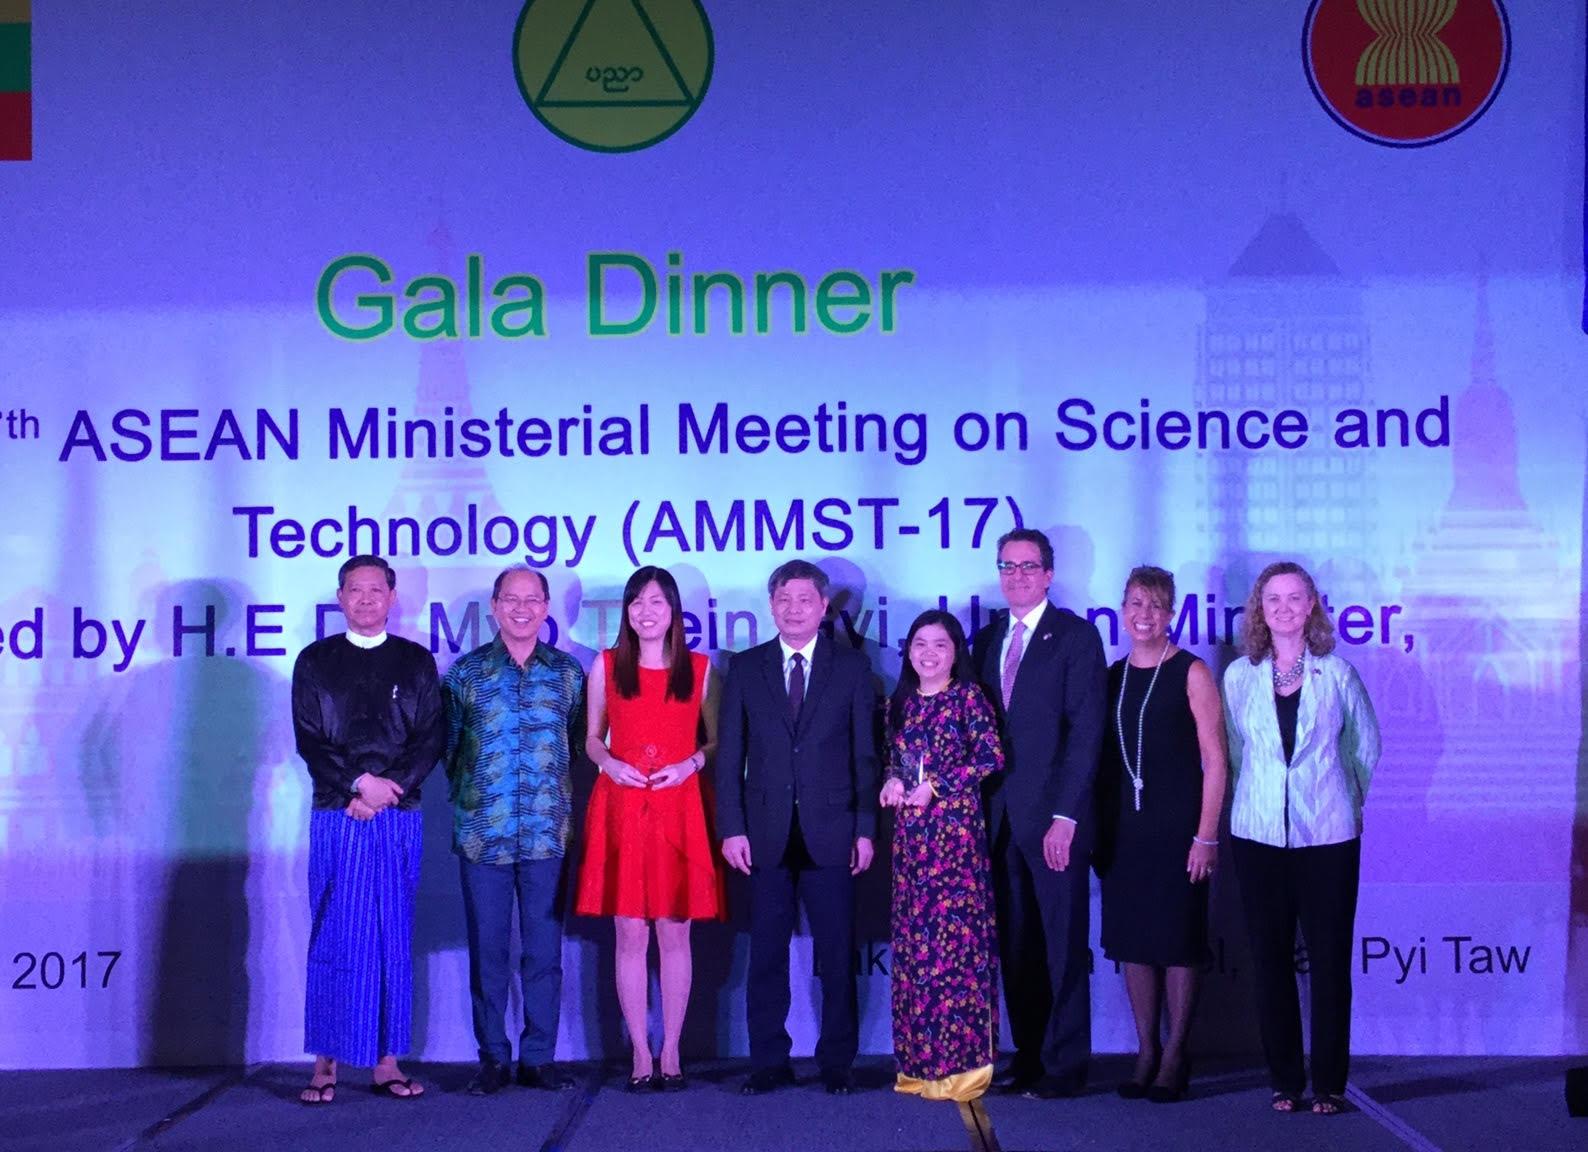 Vietnamese researcher wins ASEAN-U.S. Science Prize for Women